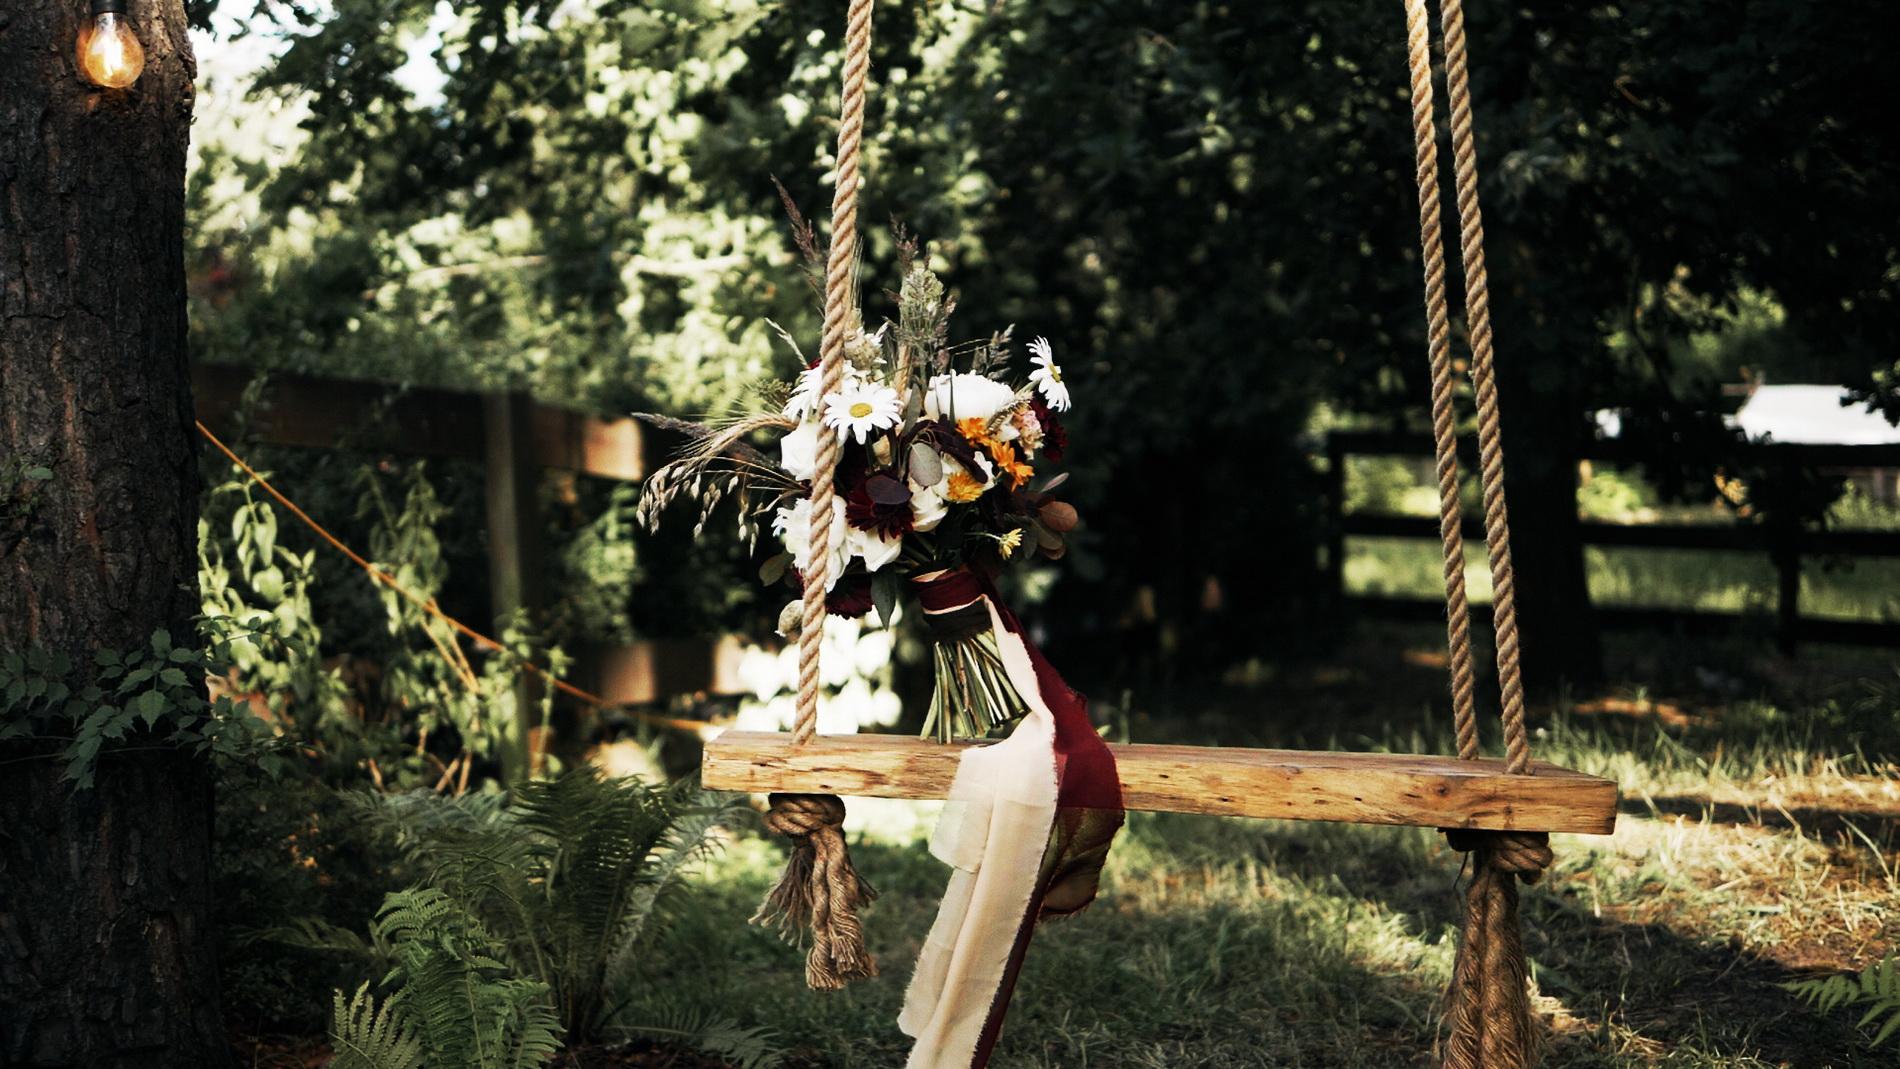 wedding_editorial_art_film_portrait_videographer_sesja_slubna_stylizowana_boho_filmowca_teledysk_slubny 02 (6).jpg